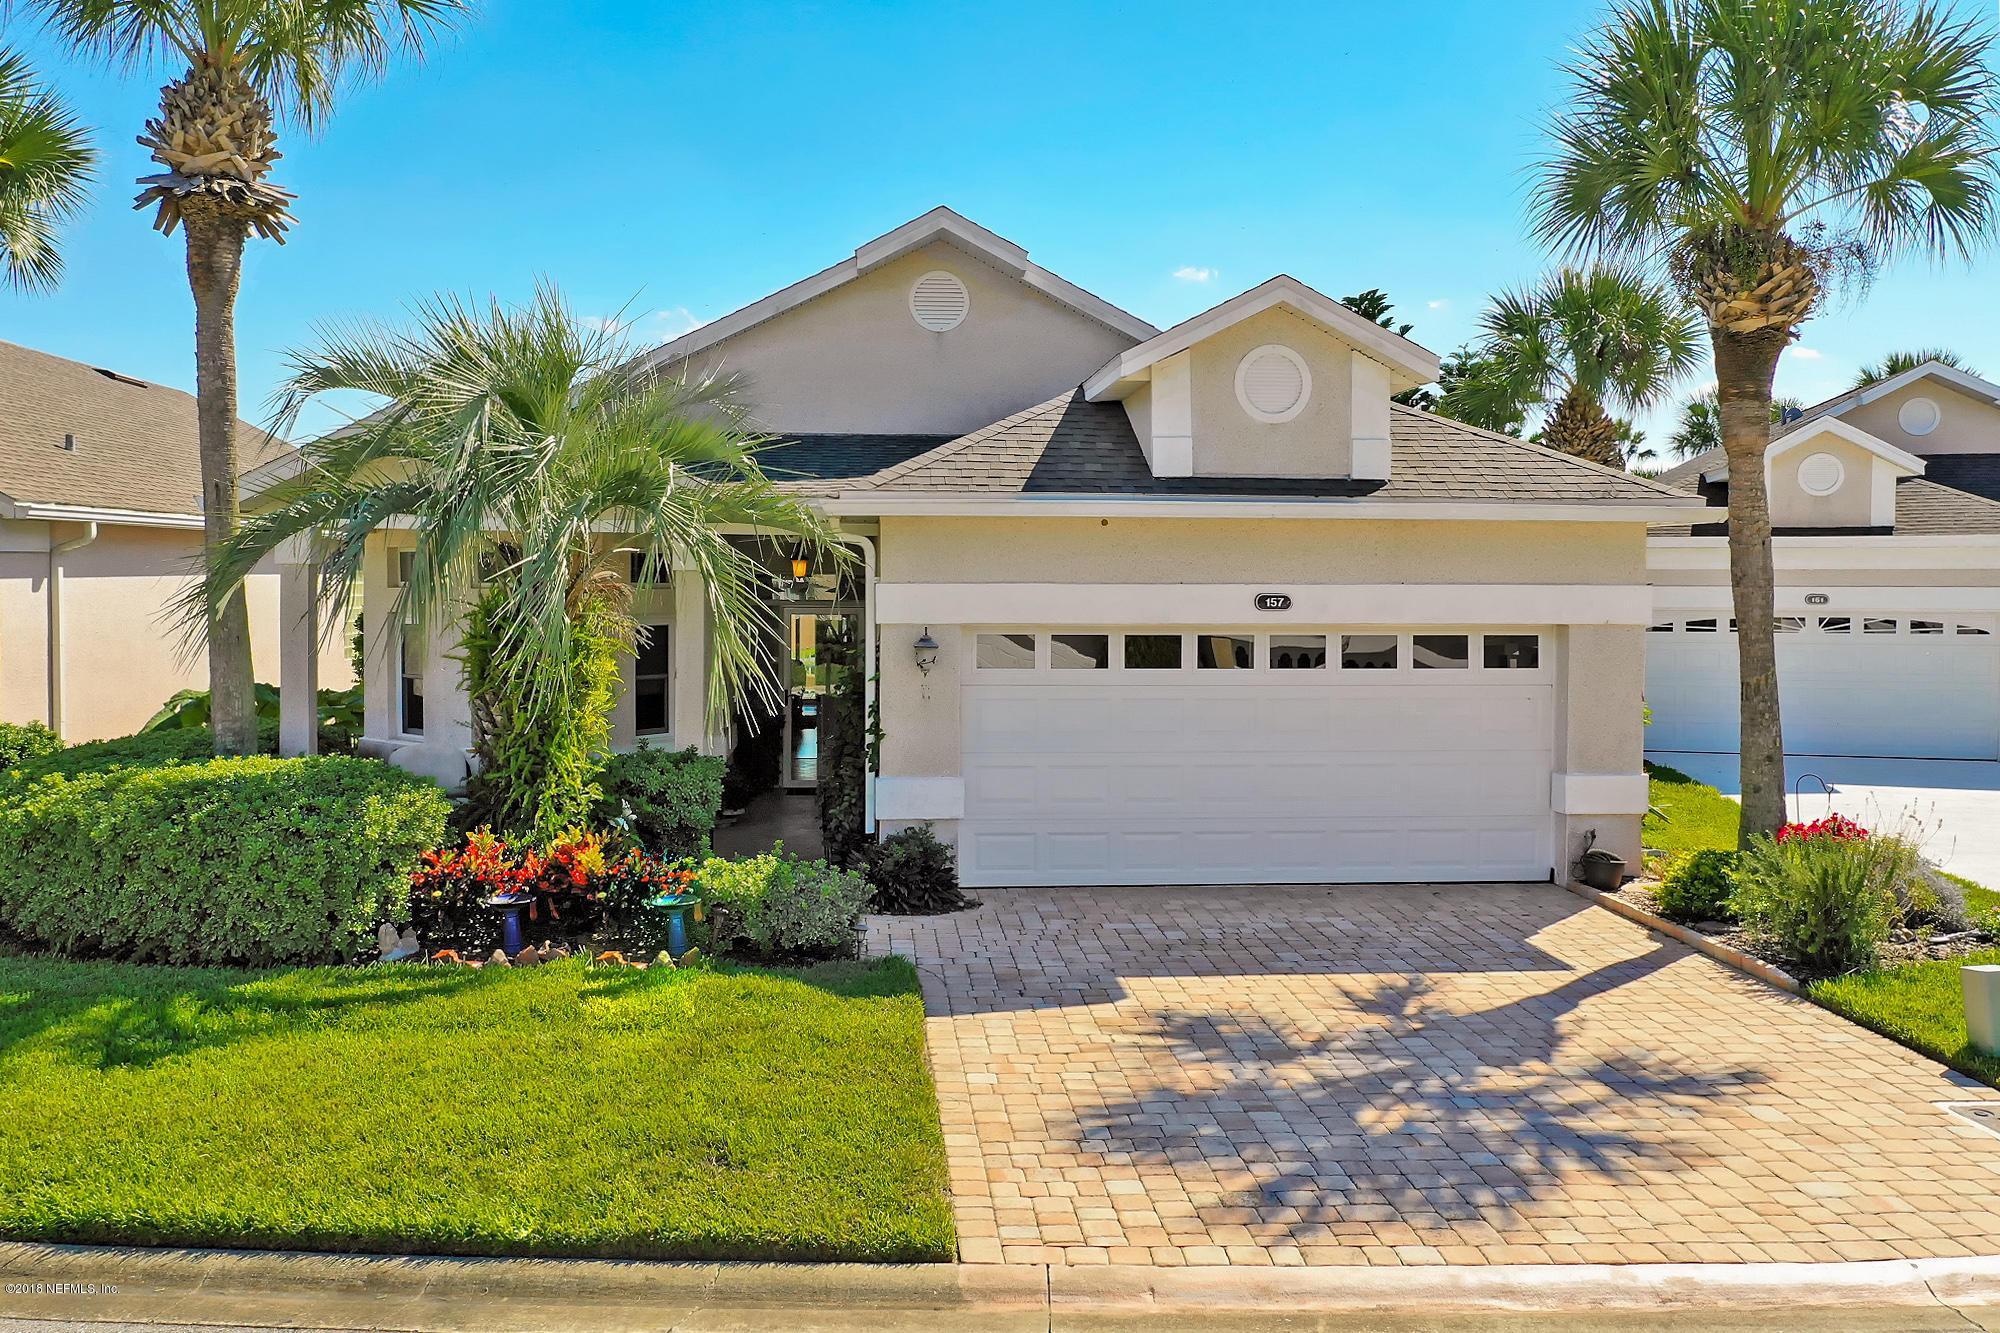 157 KINGSTON, ST AUGUSTINE, FLORIDA 32084, 2 Bedrooms Bedrooms, ,2 BathroomsBathrooms,Residential - single family,For sale,KINGSTON,962179